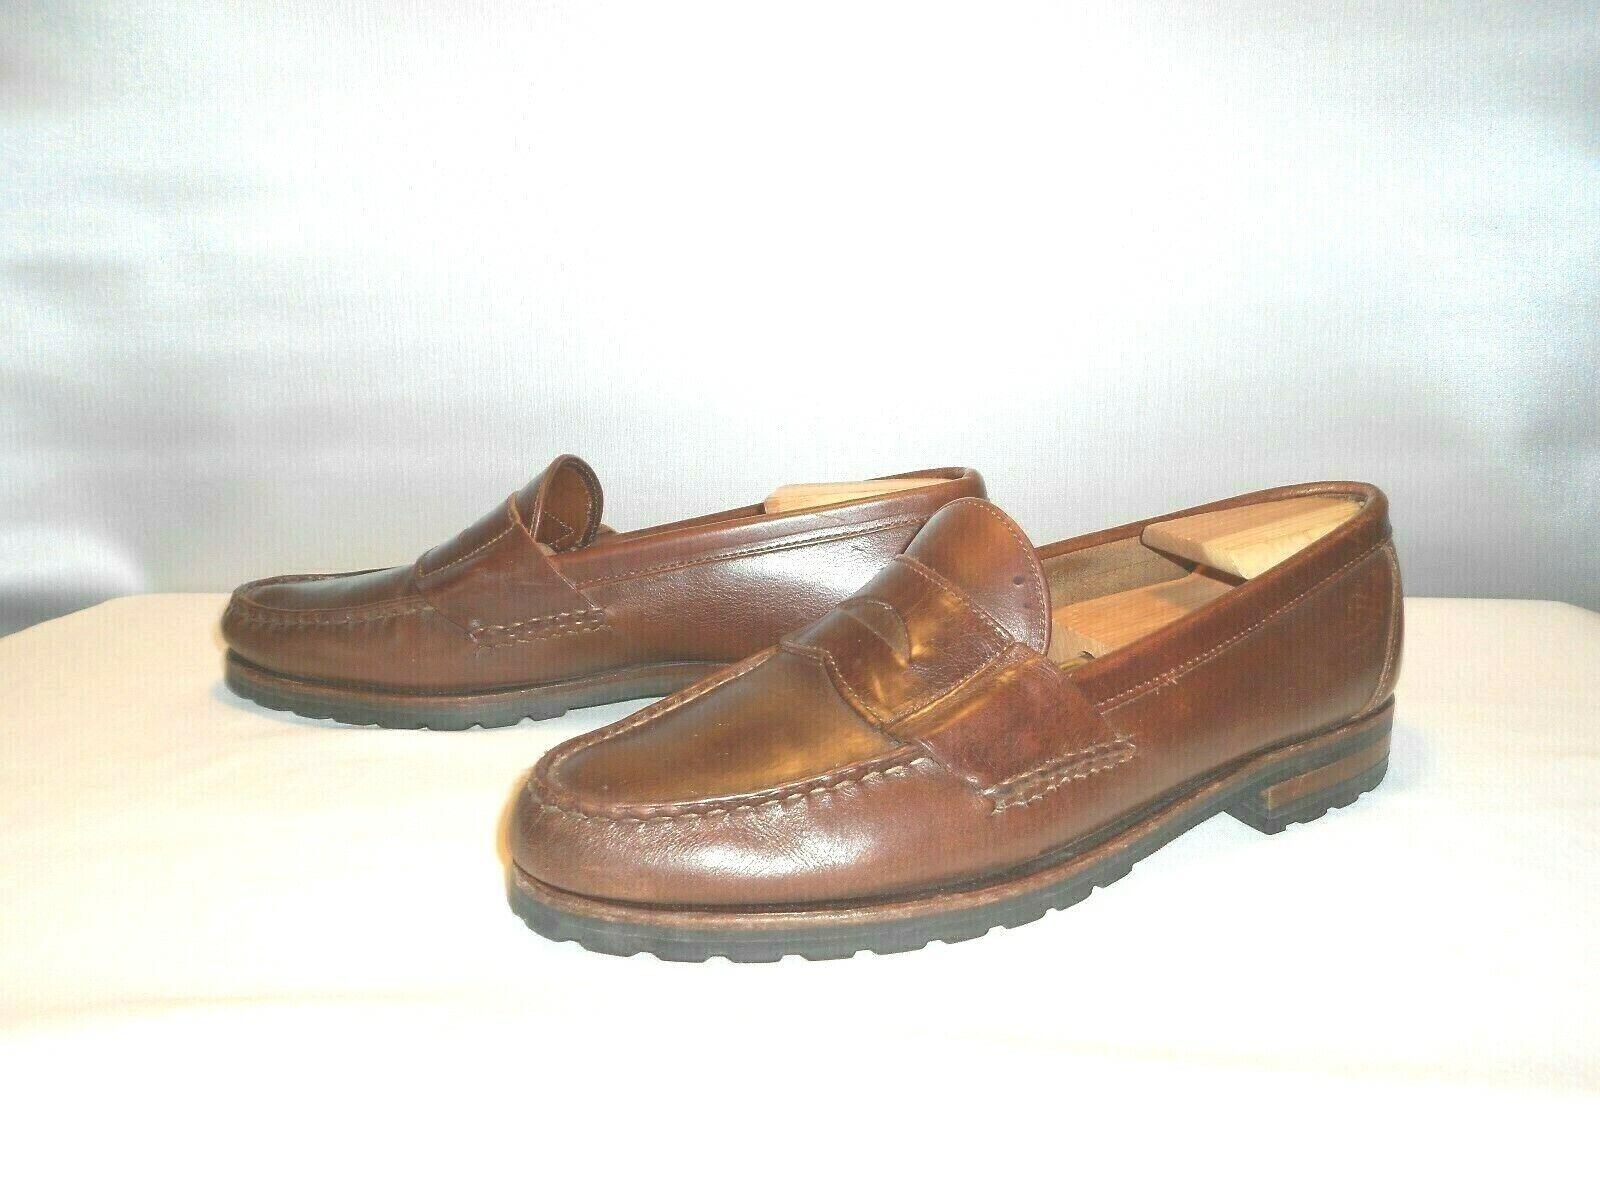 Leather Men/'s Shoes Size 10D Size 10D Allen Edmonds Penny Loafers Allen Edmonds Men/'s Dress Shoes Brown Black Casual Penny Loafers